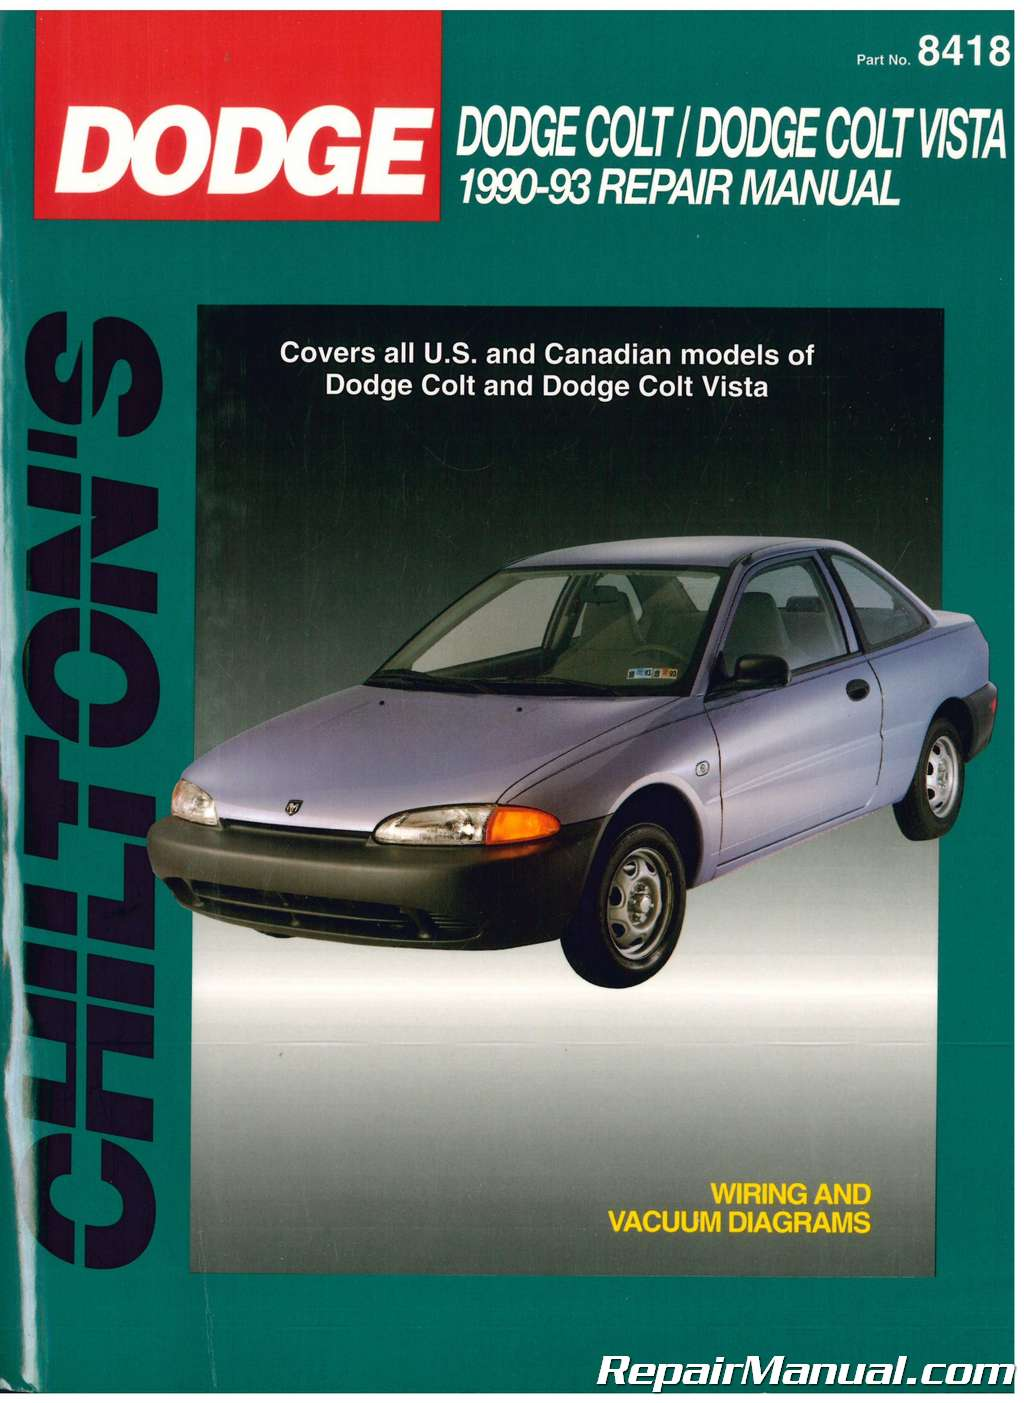 used chilton dodge colt dodge colt vista 1990 1993 repair manual1990 Dodge Colt Engine Diagram #3